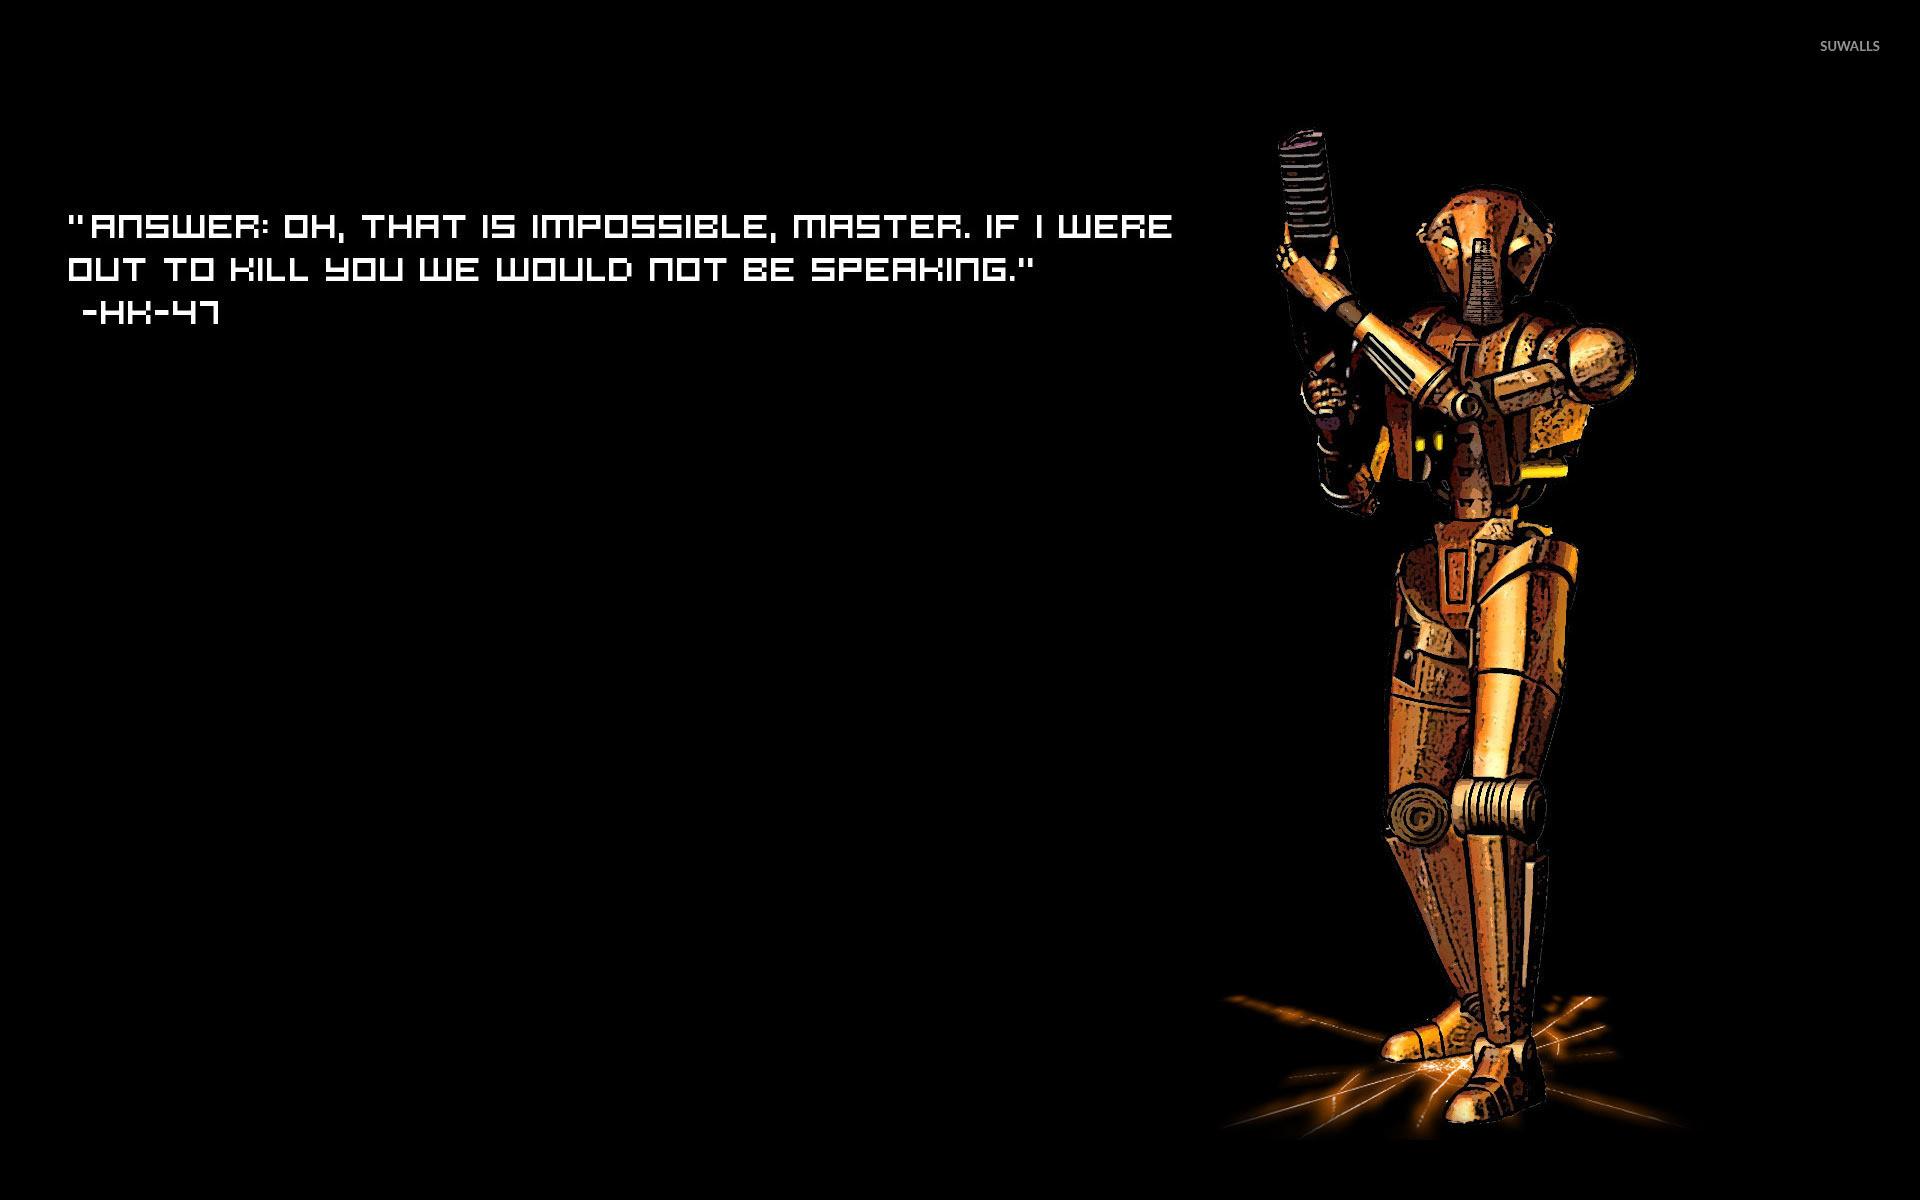 Star Wars quote wallpaper jpg